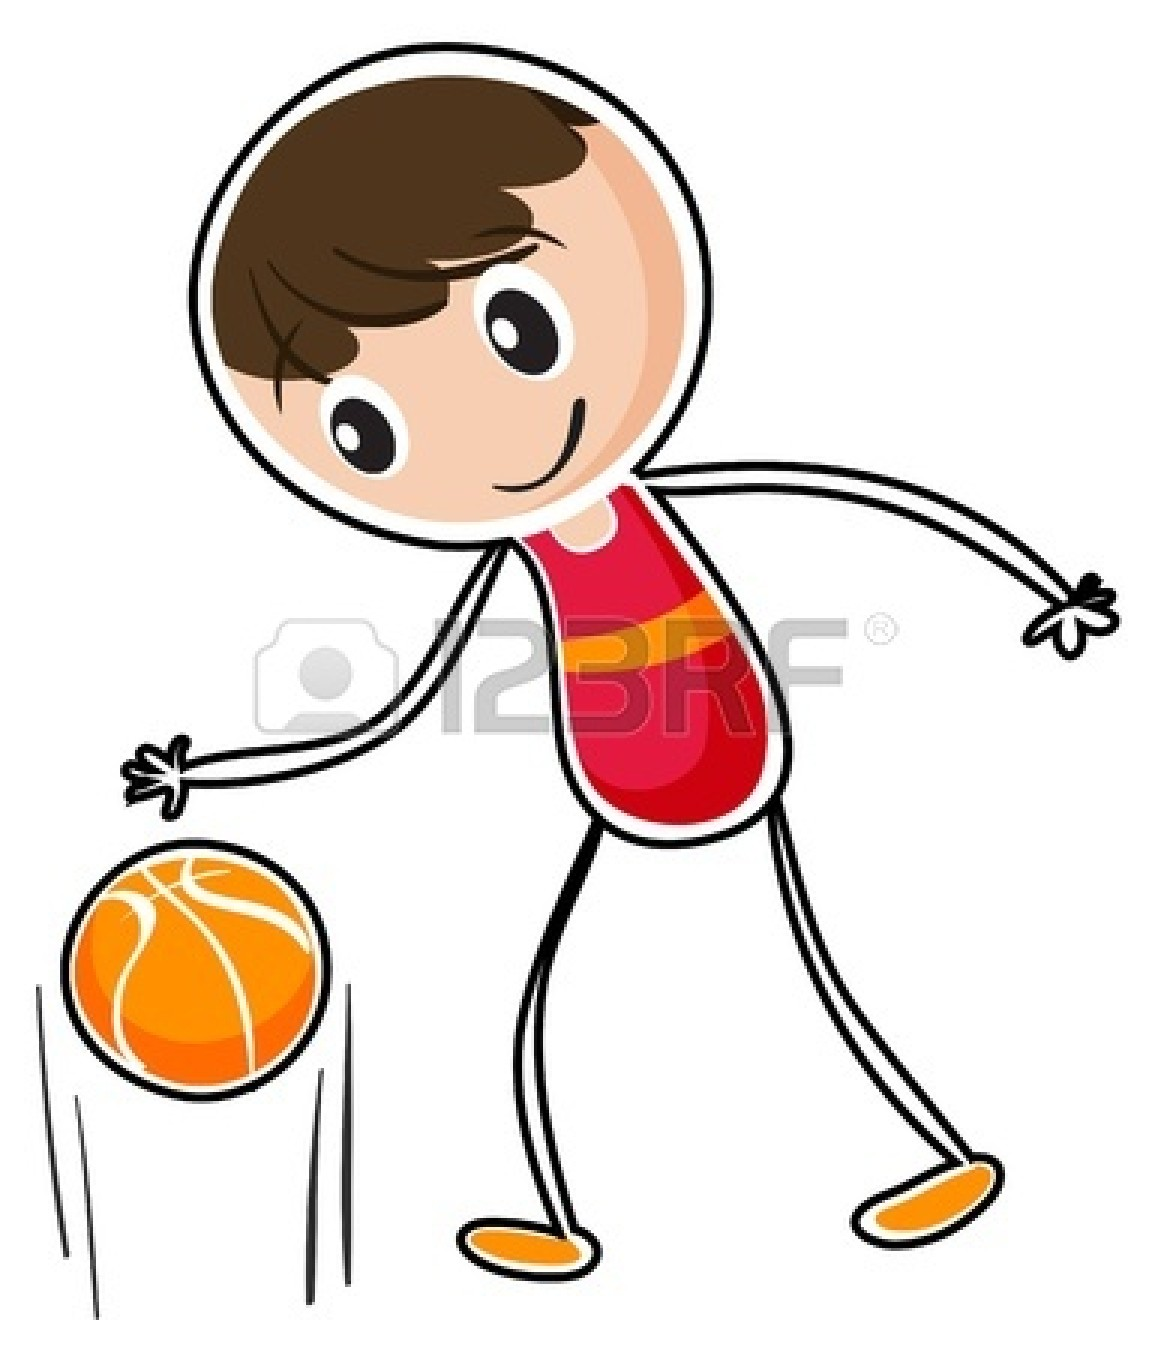 Bouncing Ball Clipart - Clipart Kid